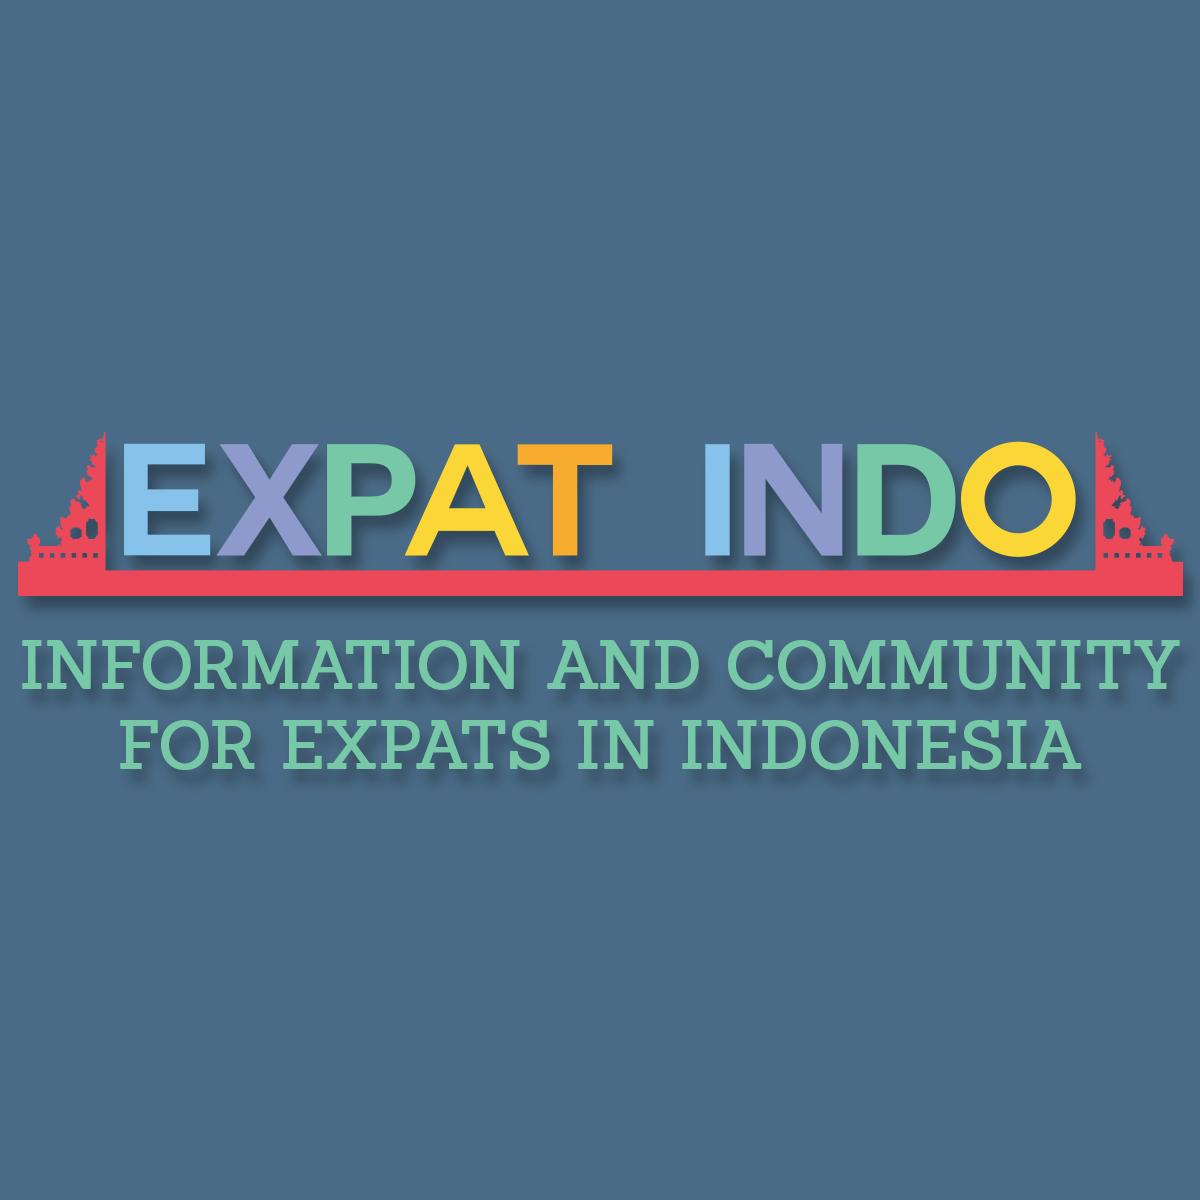 www.expatindo.org